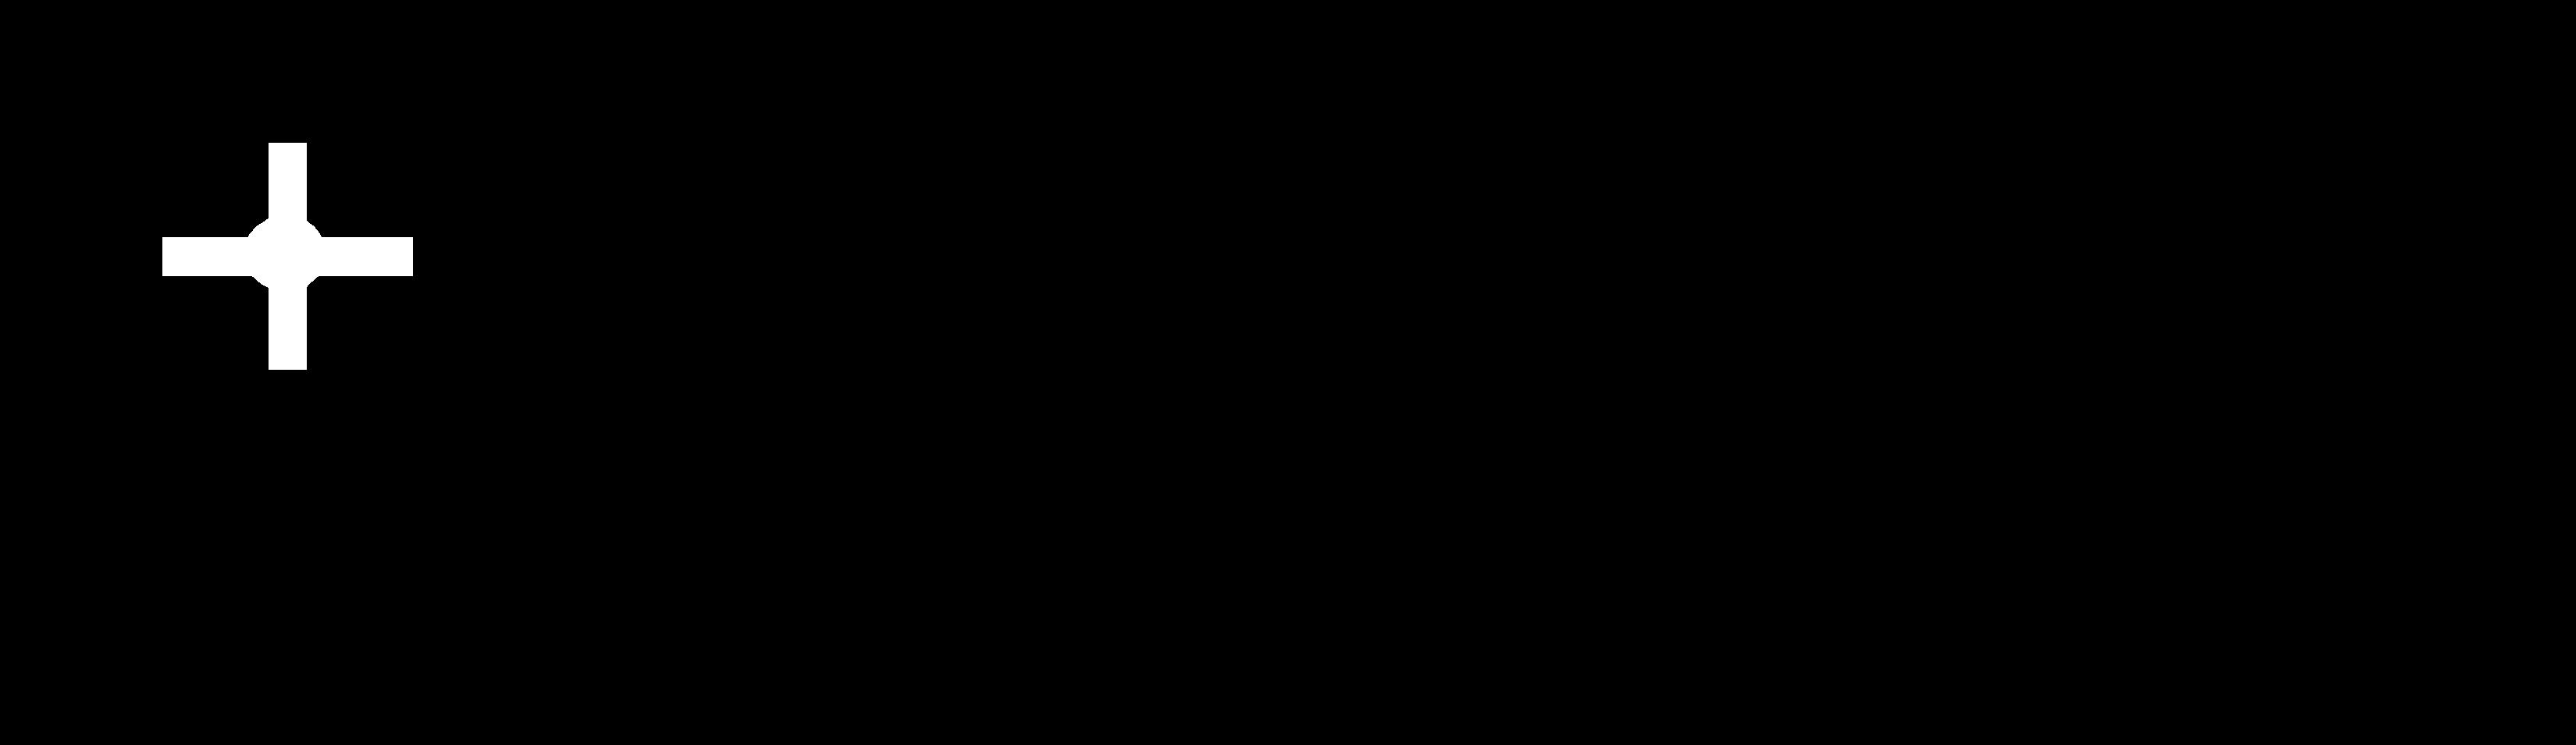 chertezh 5m5 kreptech